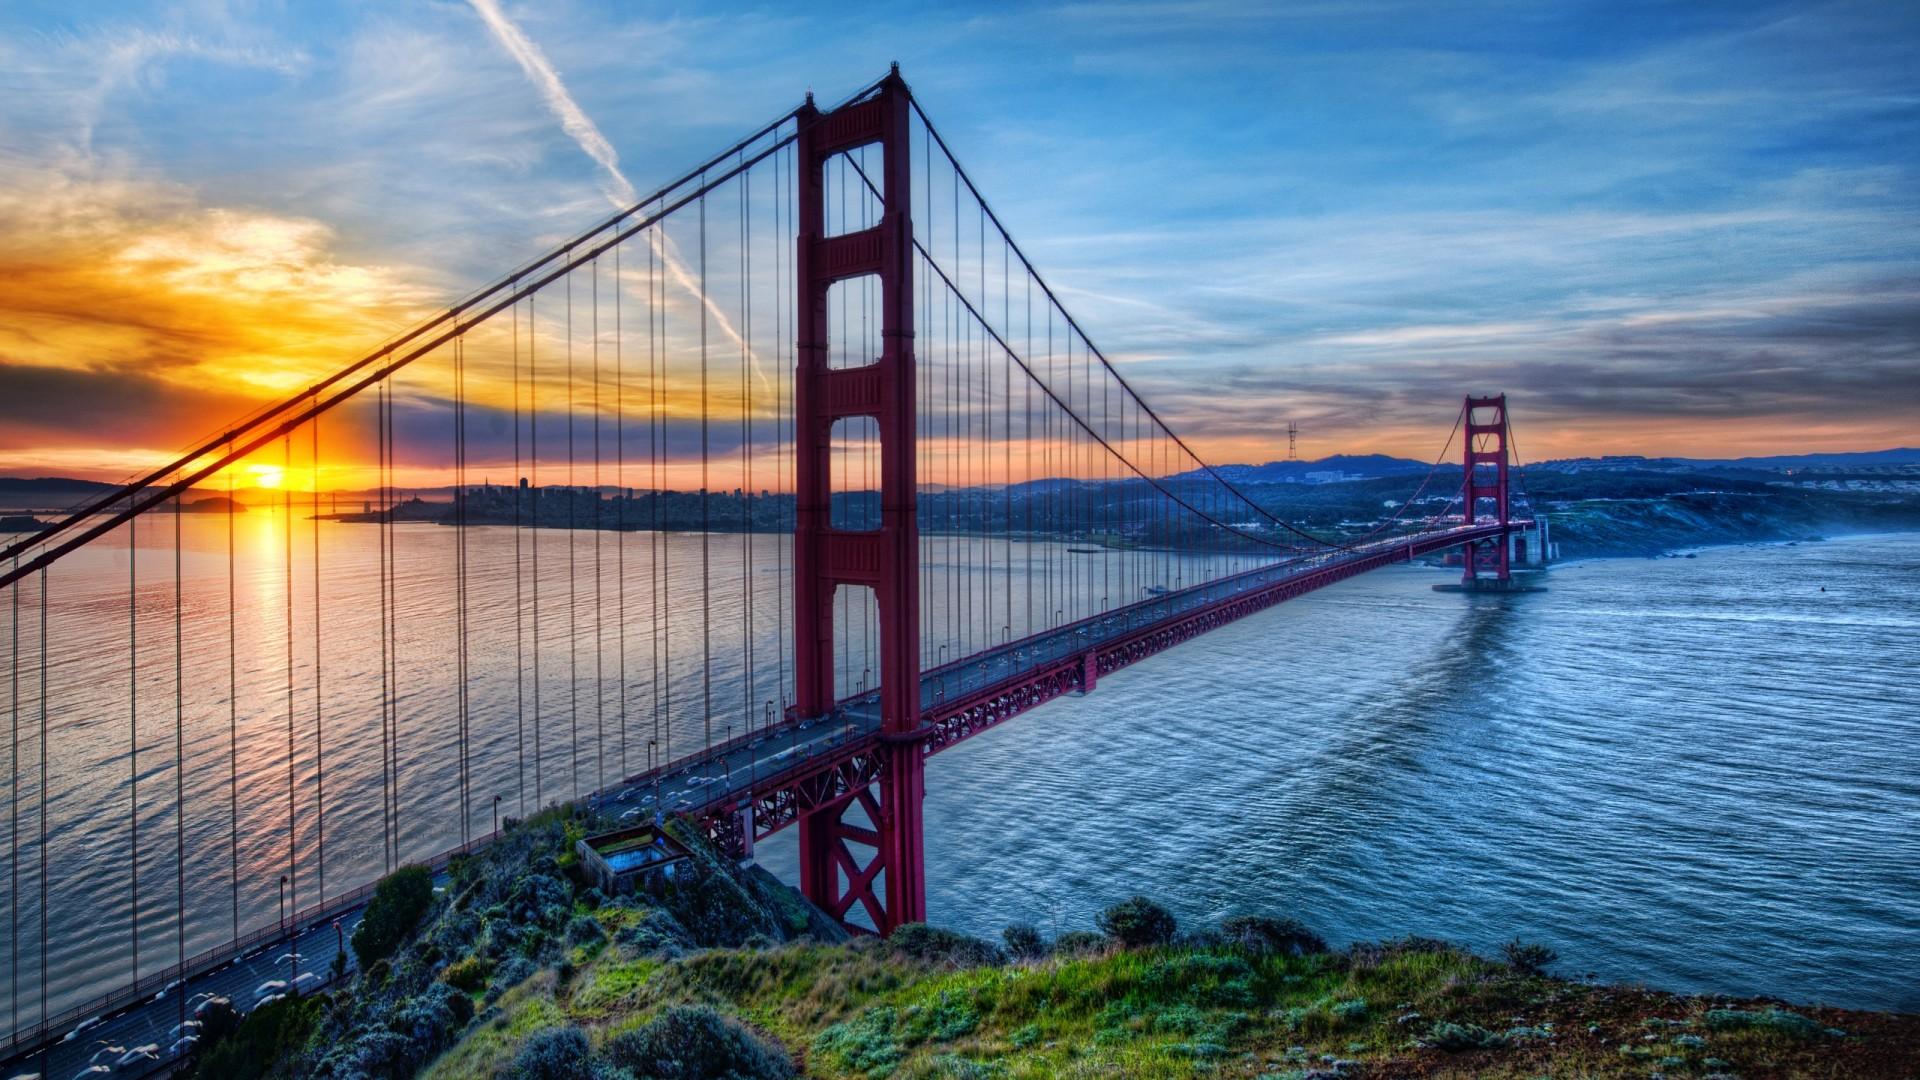 golden gate bridge san francisco best travel tips